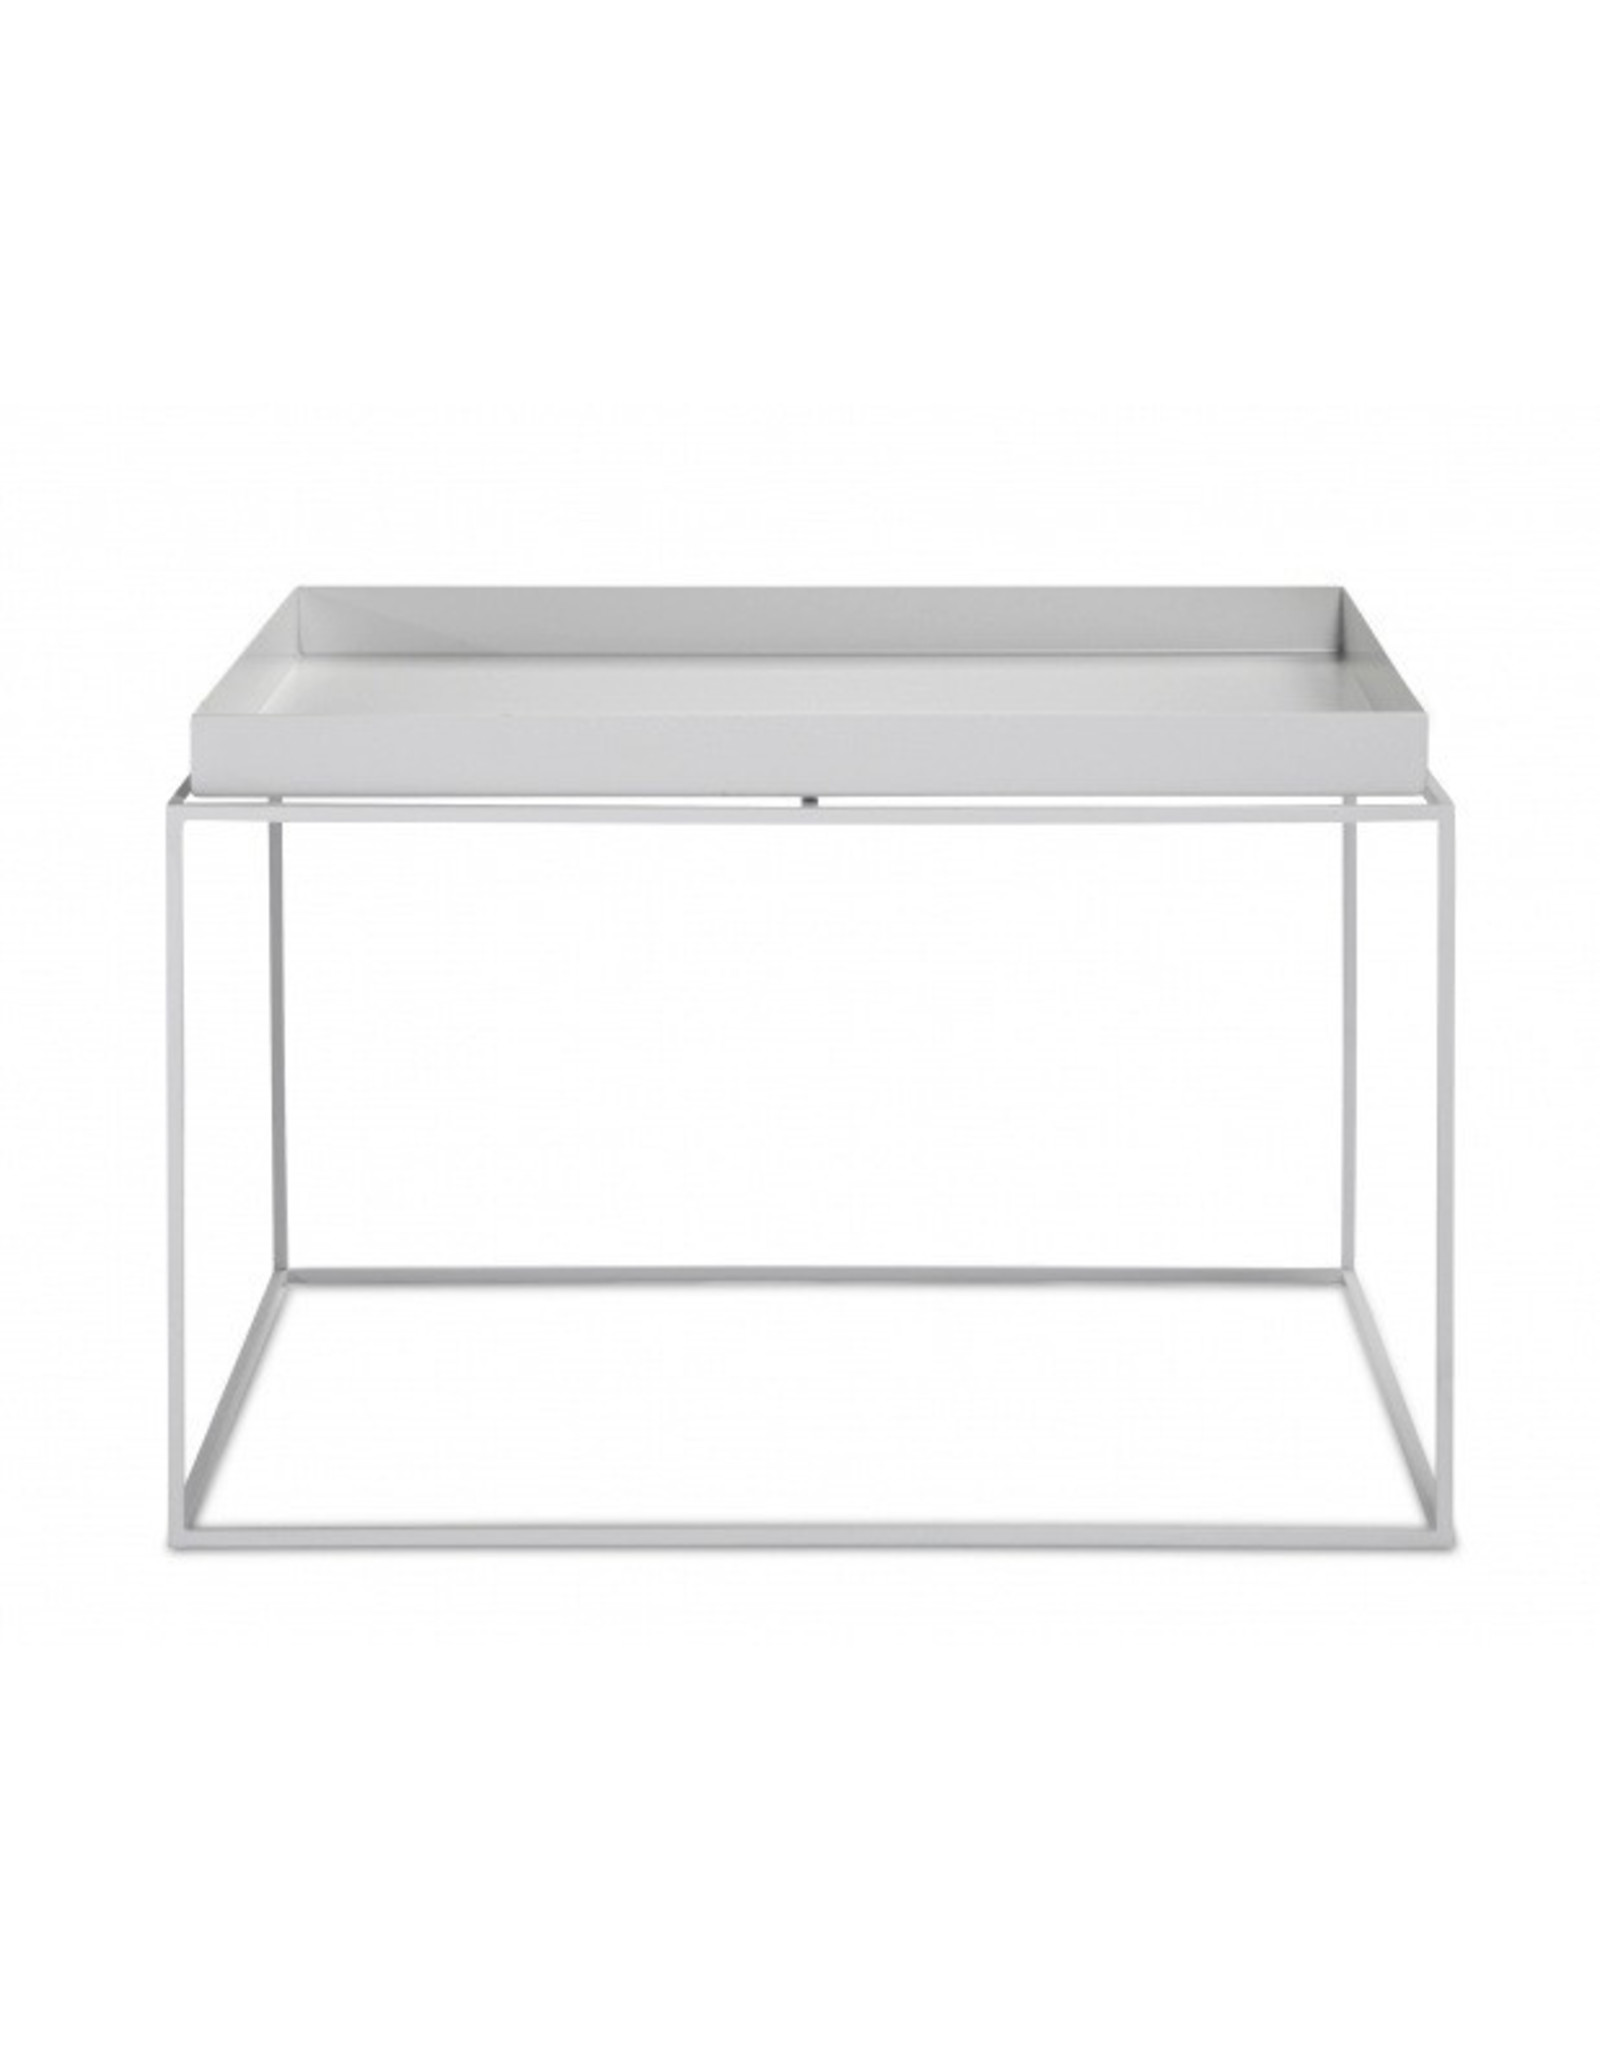 HAY Tray Table White